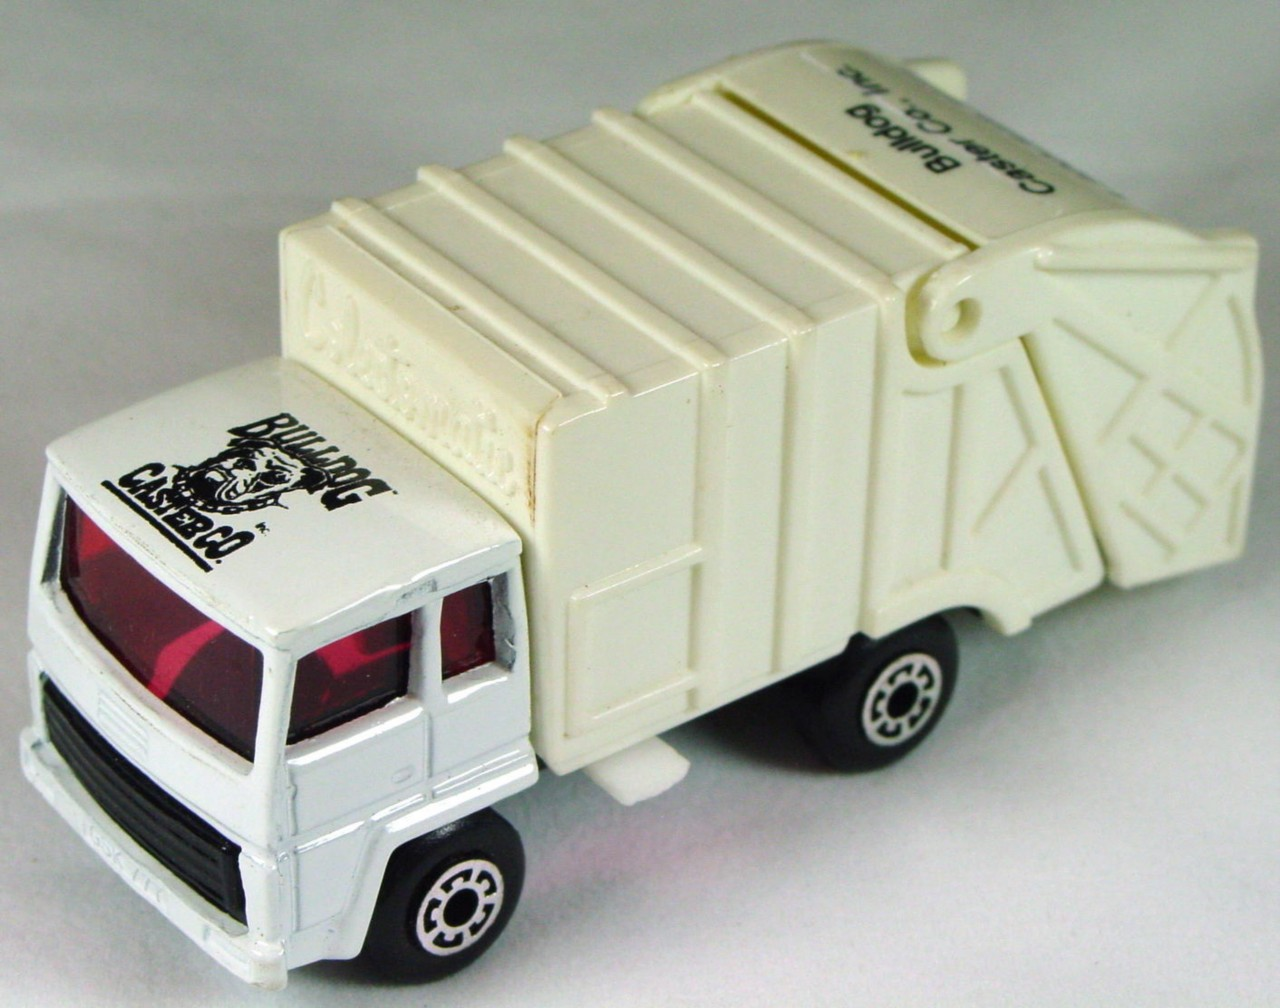 ASAP-CCI 36 D 29 - Refuse Truck White black base Bulldog Castor made in China ASAP